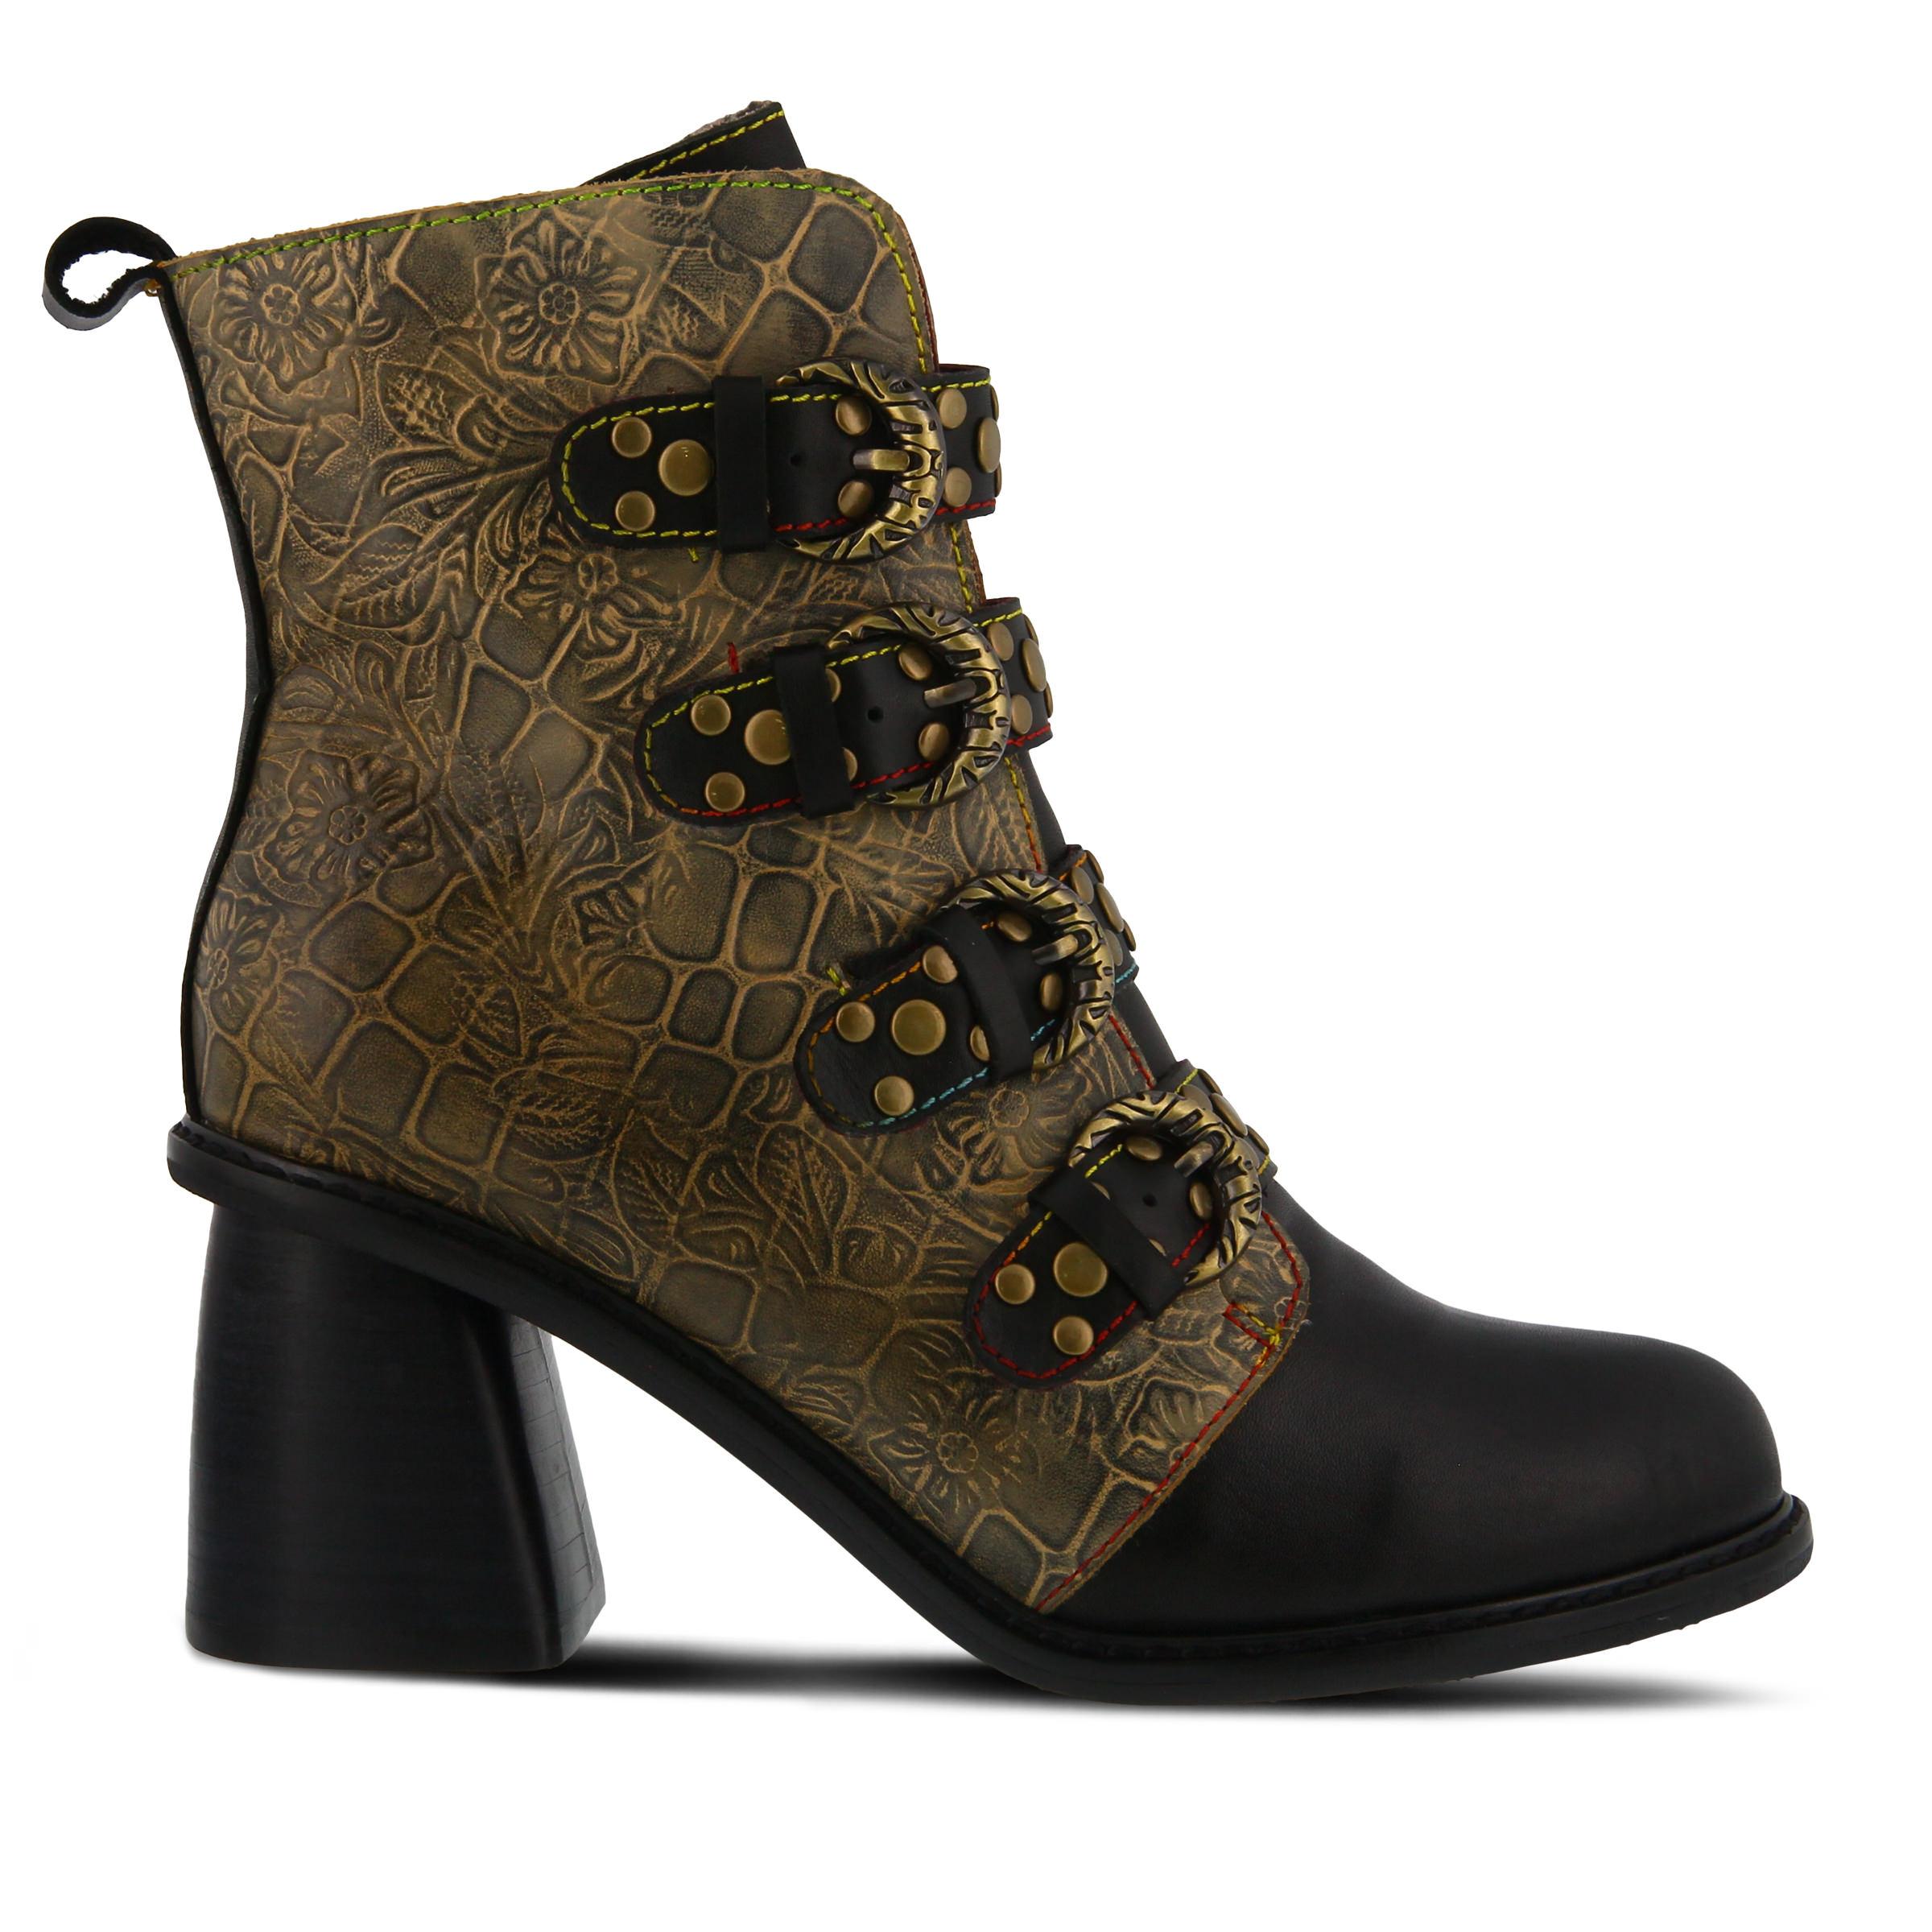 L'Artiste Wonderland Women's Boots (Black Leather)